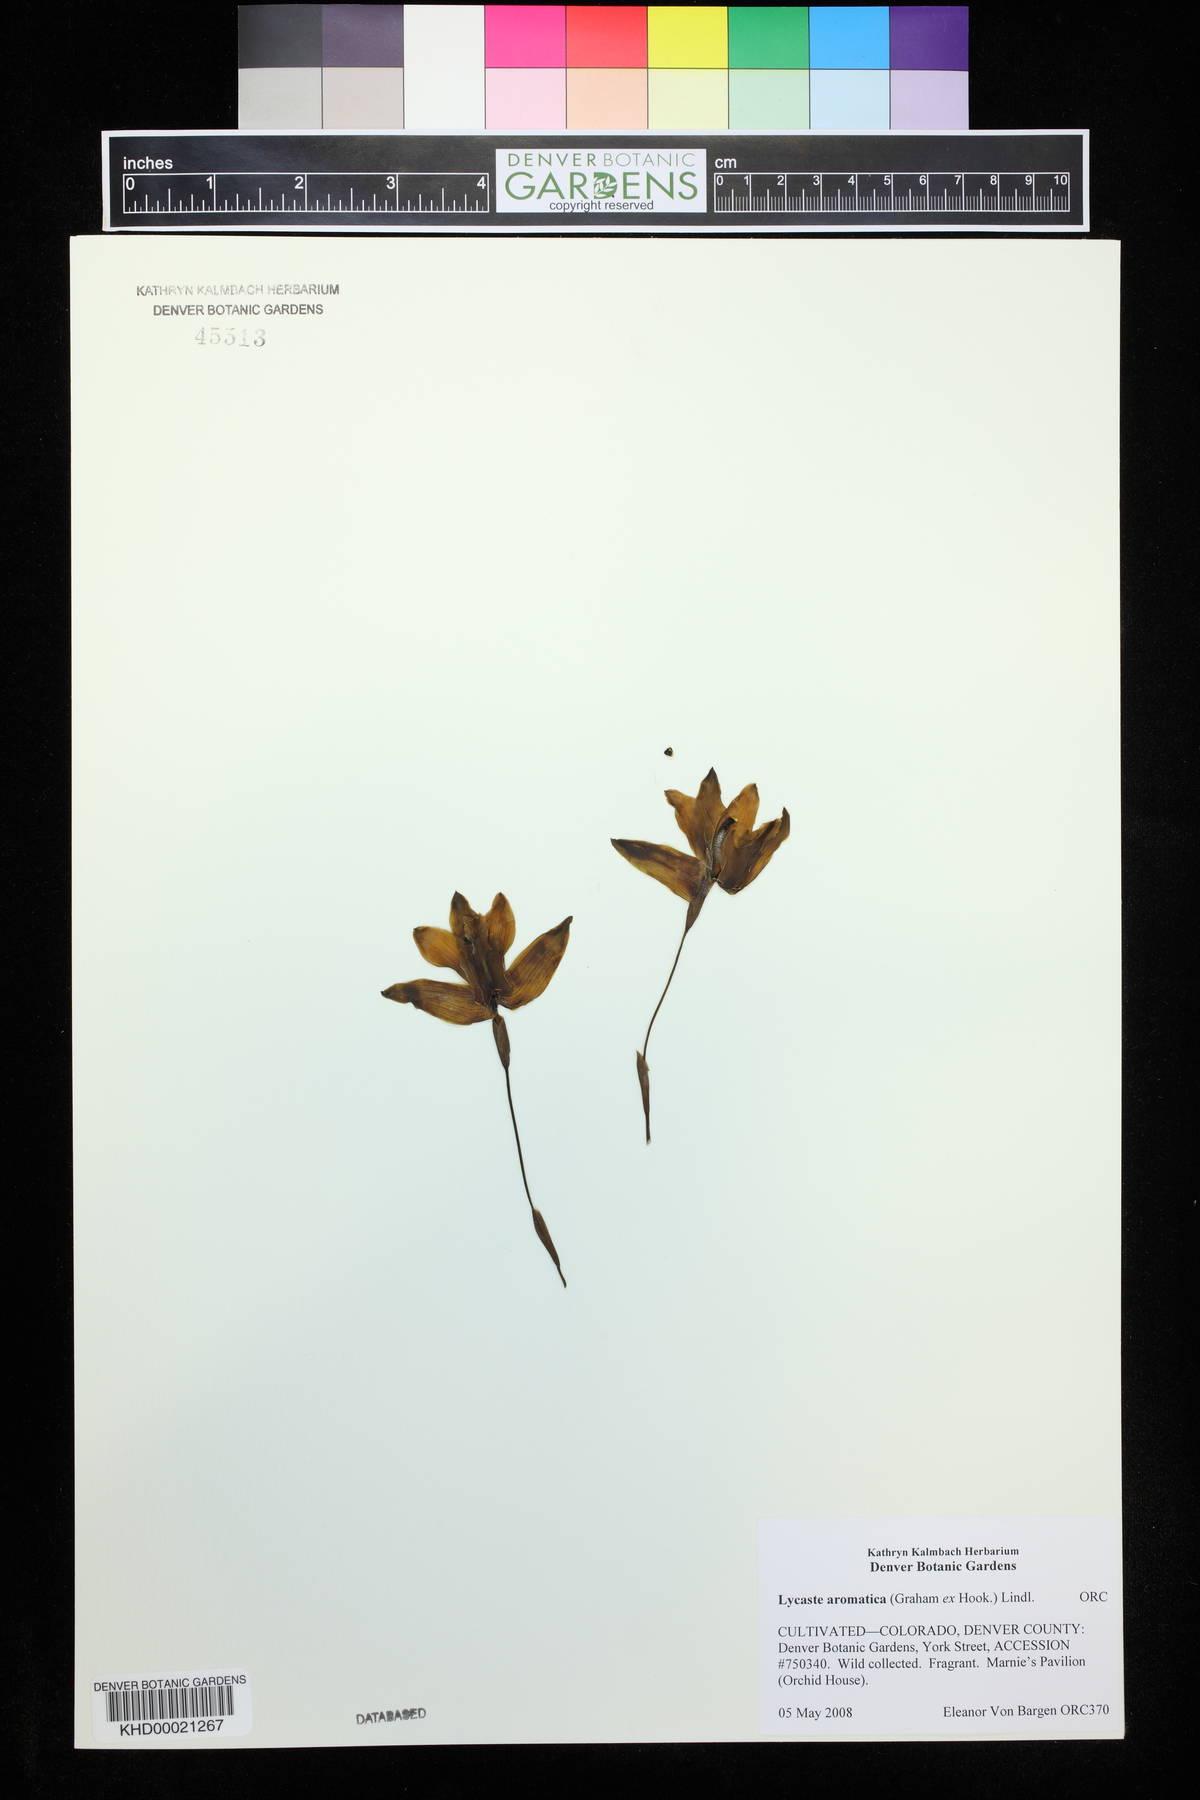 Lycaste aromatica image